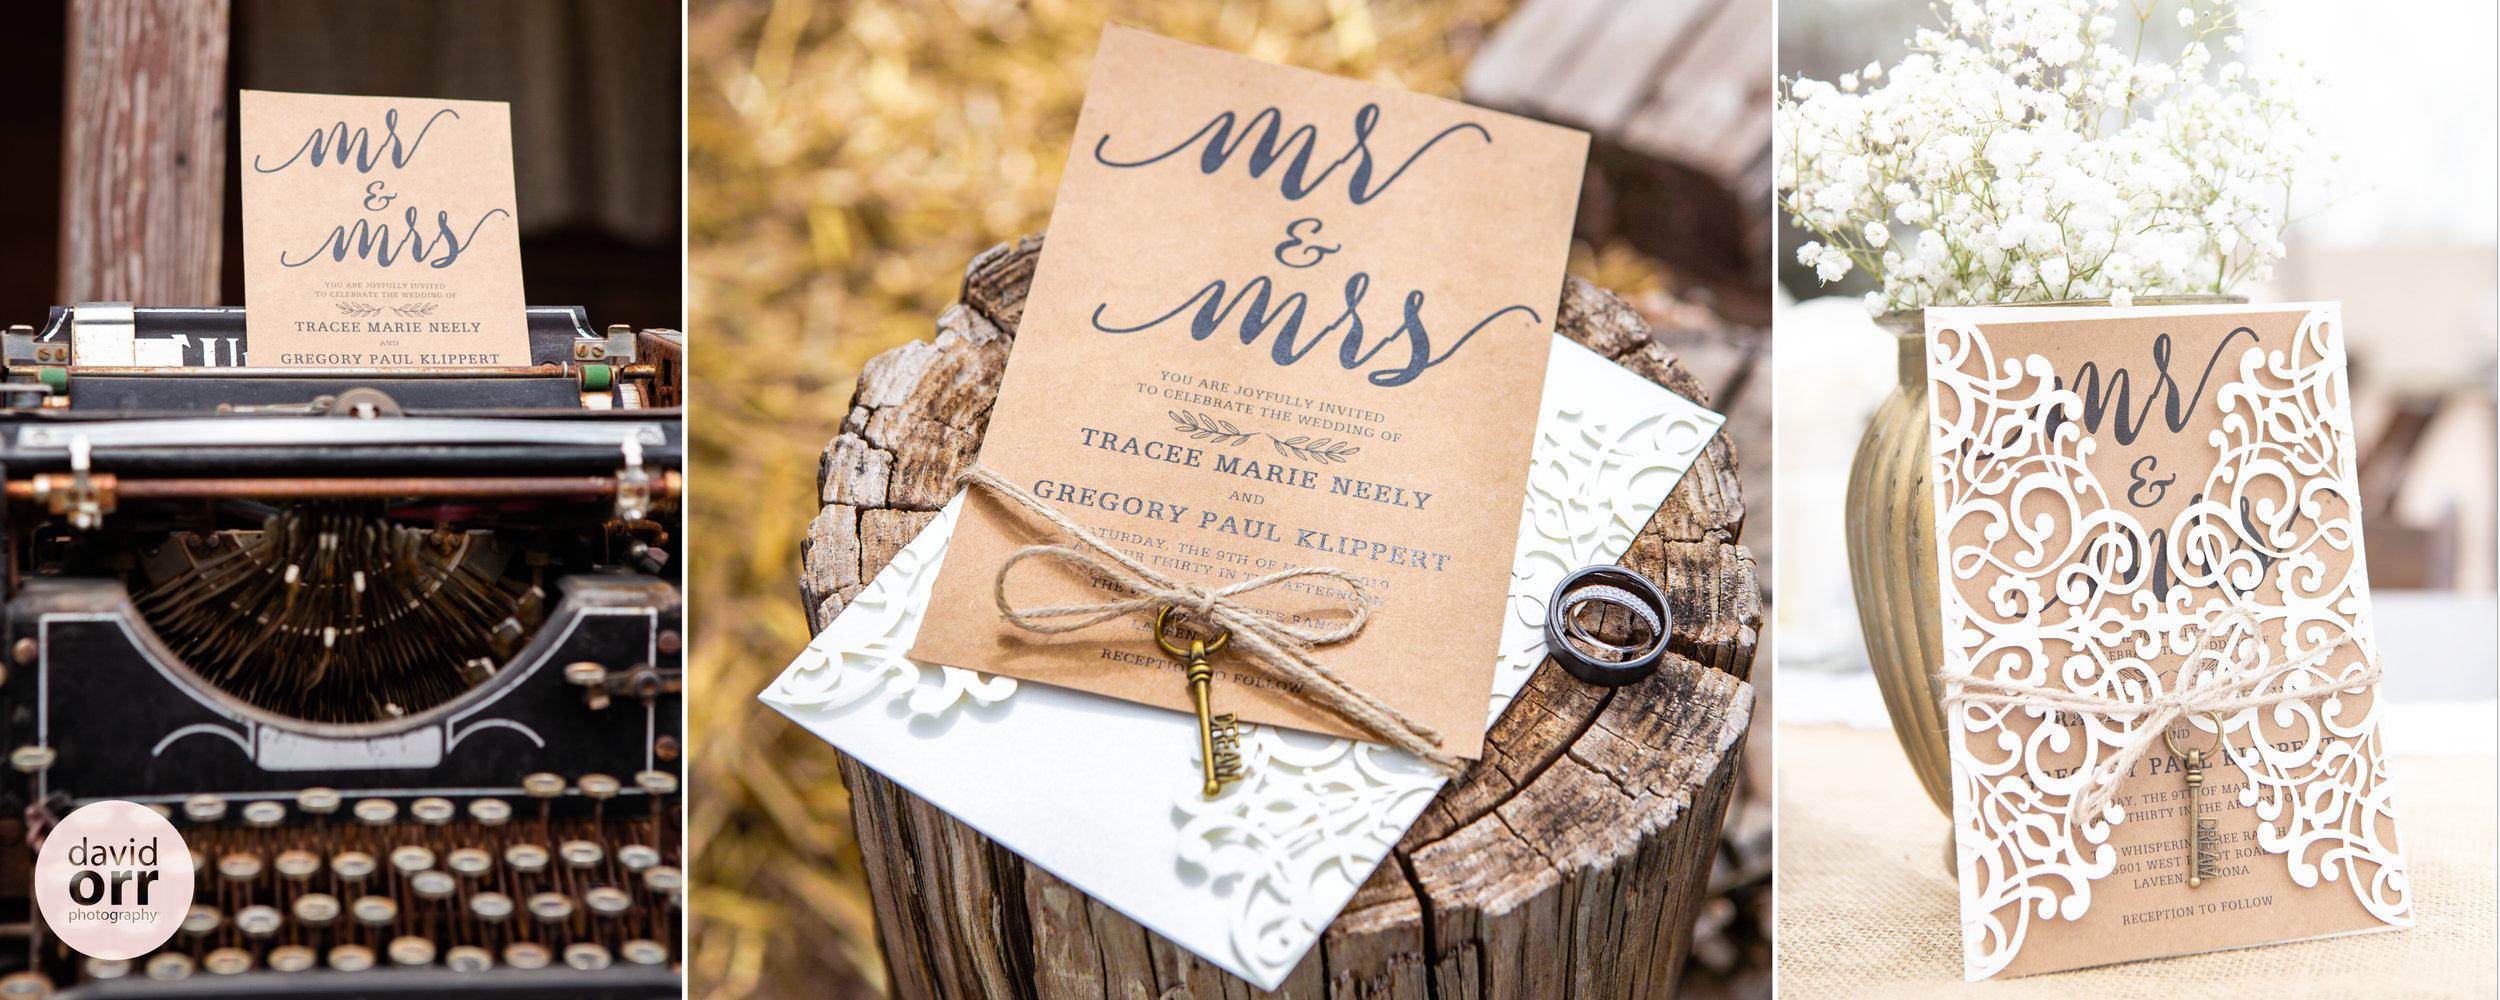 DavidOrrPhotography_Wedding-Invitation-Ideas.jpg